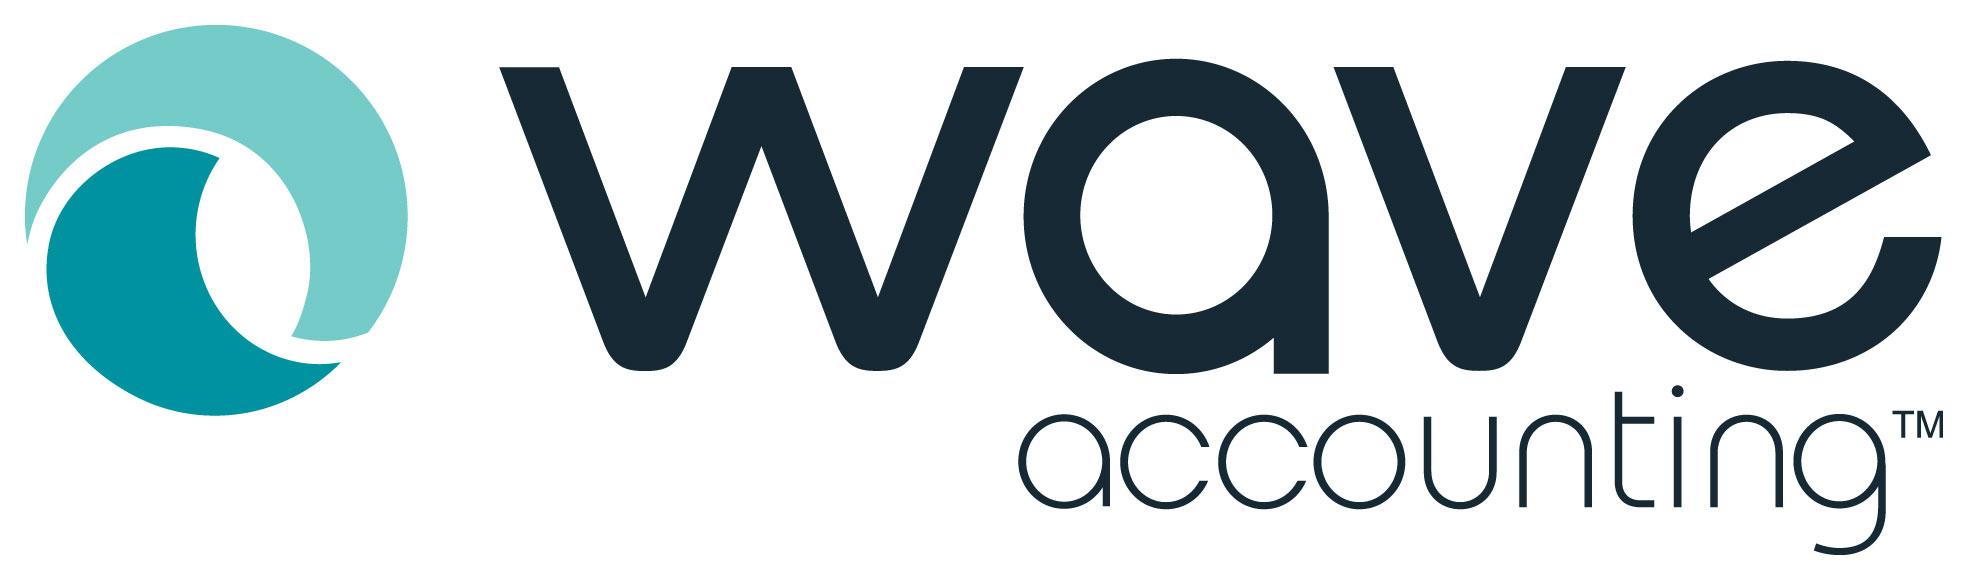 WaveAccounting_logo